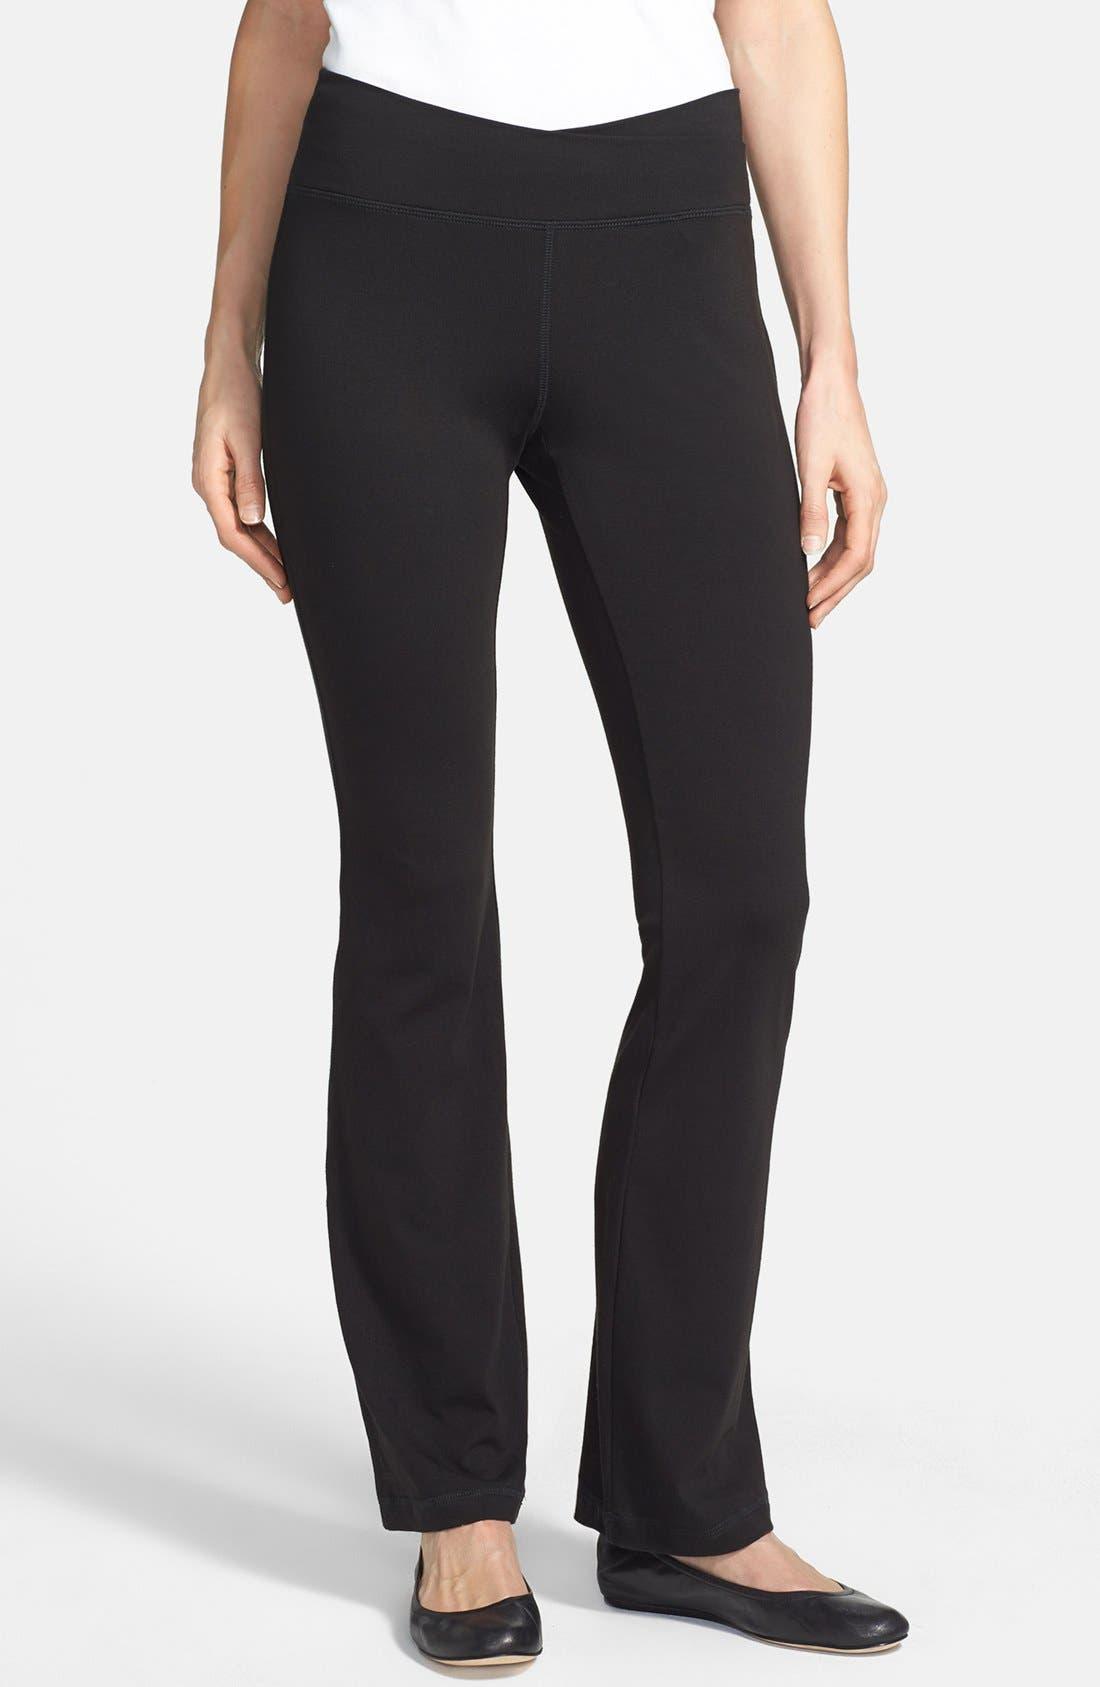 Alternate Image 1 Selected - Eileen Fisher Organic Cotton Yoga Pants (Regular & Petite)